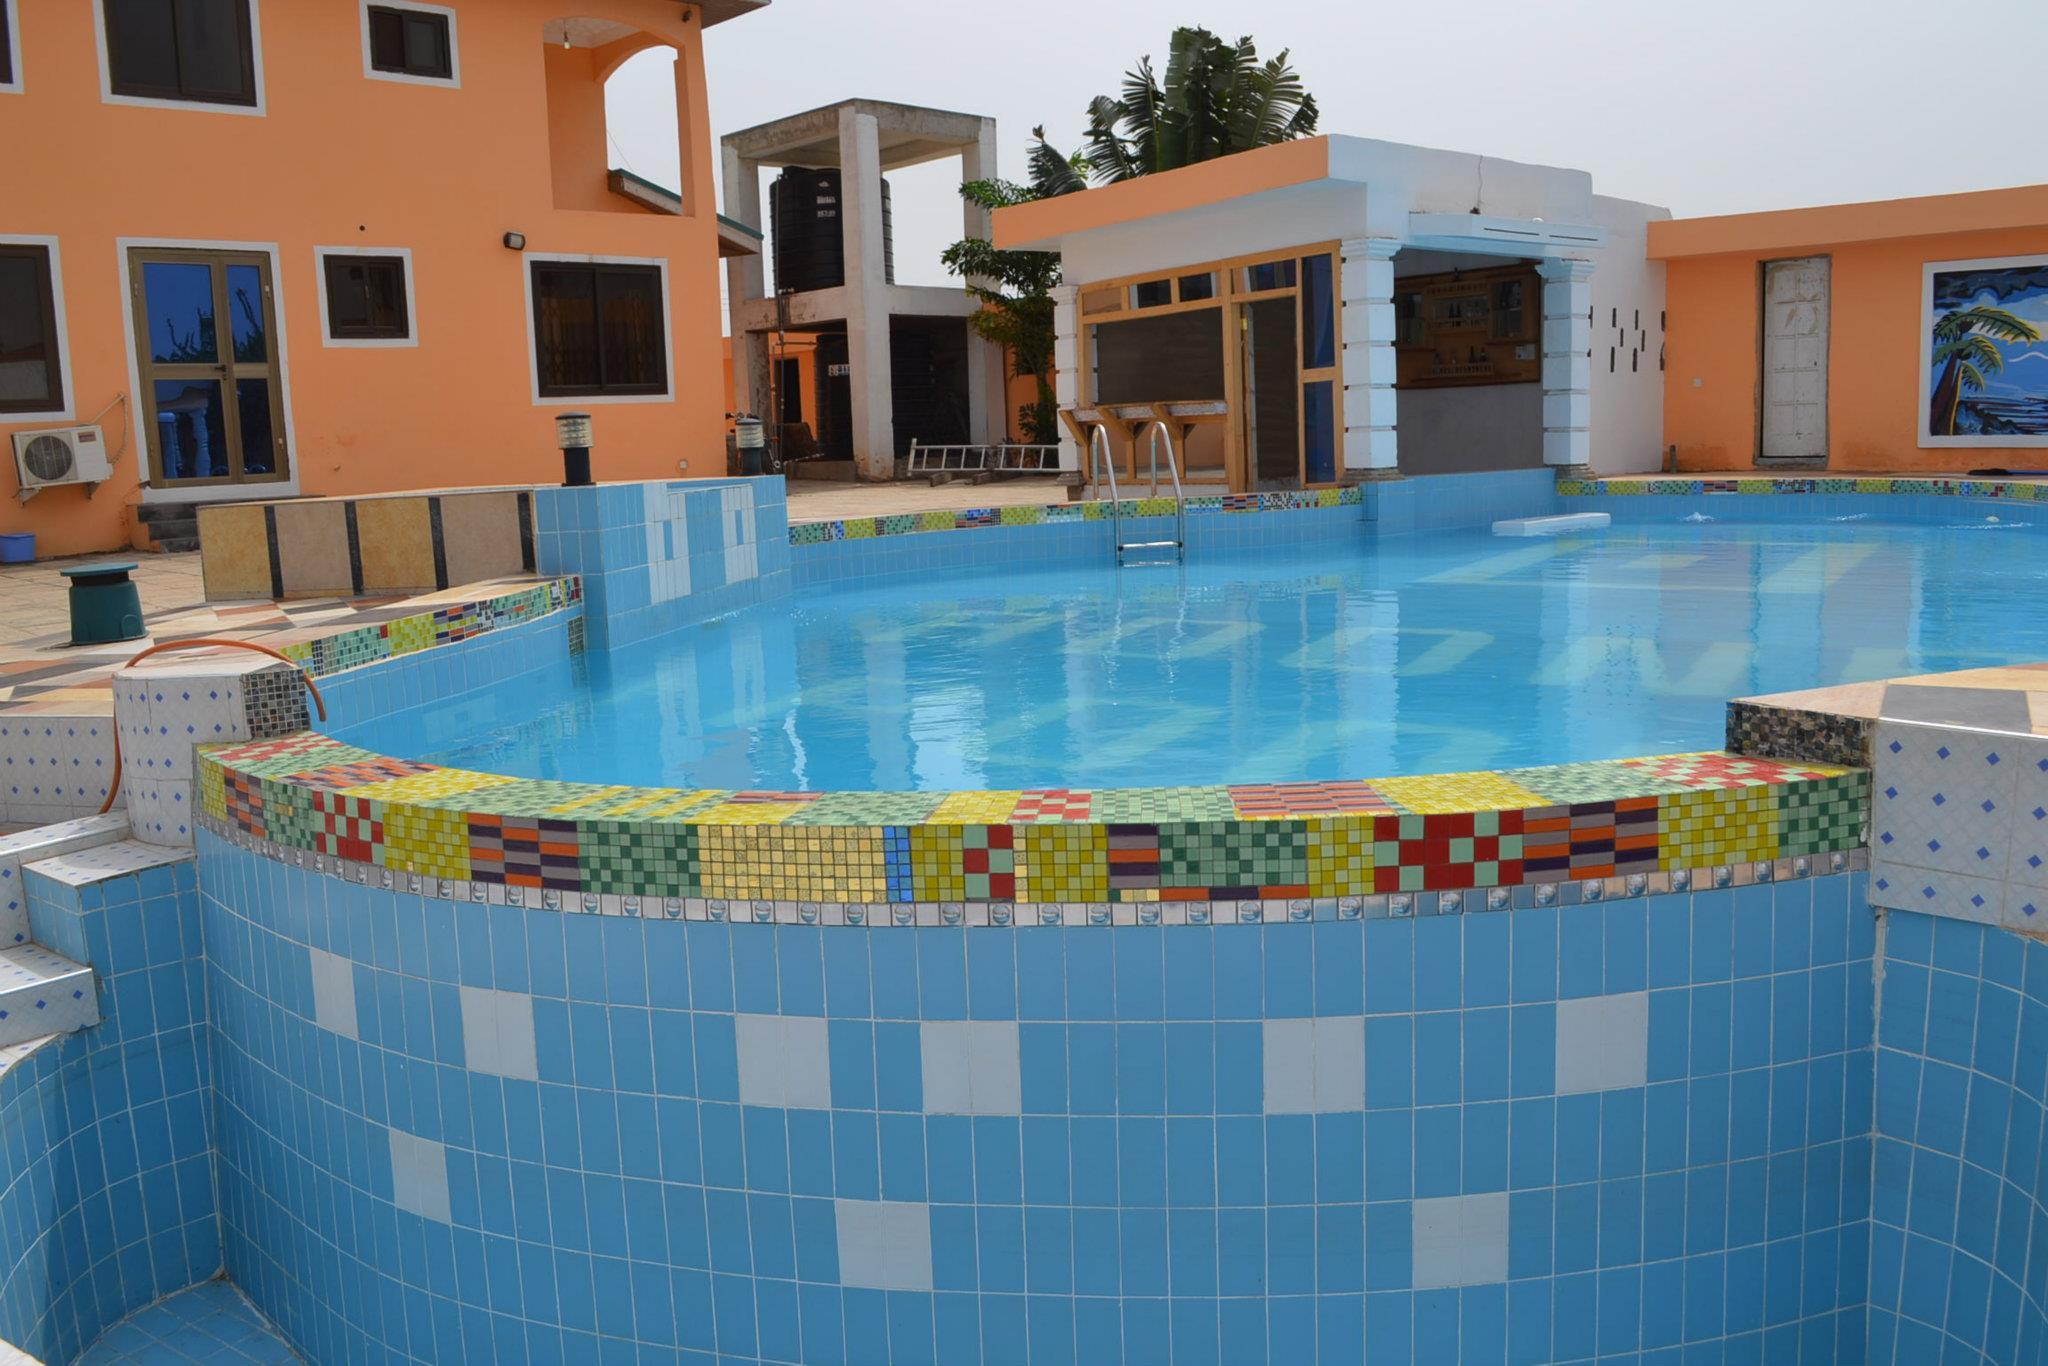 Ghlisting Hotels in Ghana, Events in Ghana |   adonaiH12